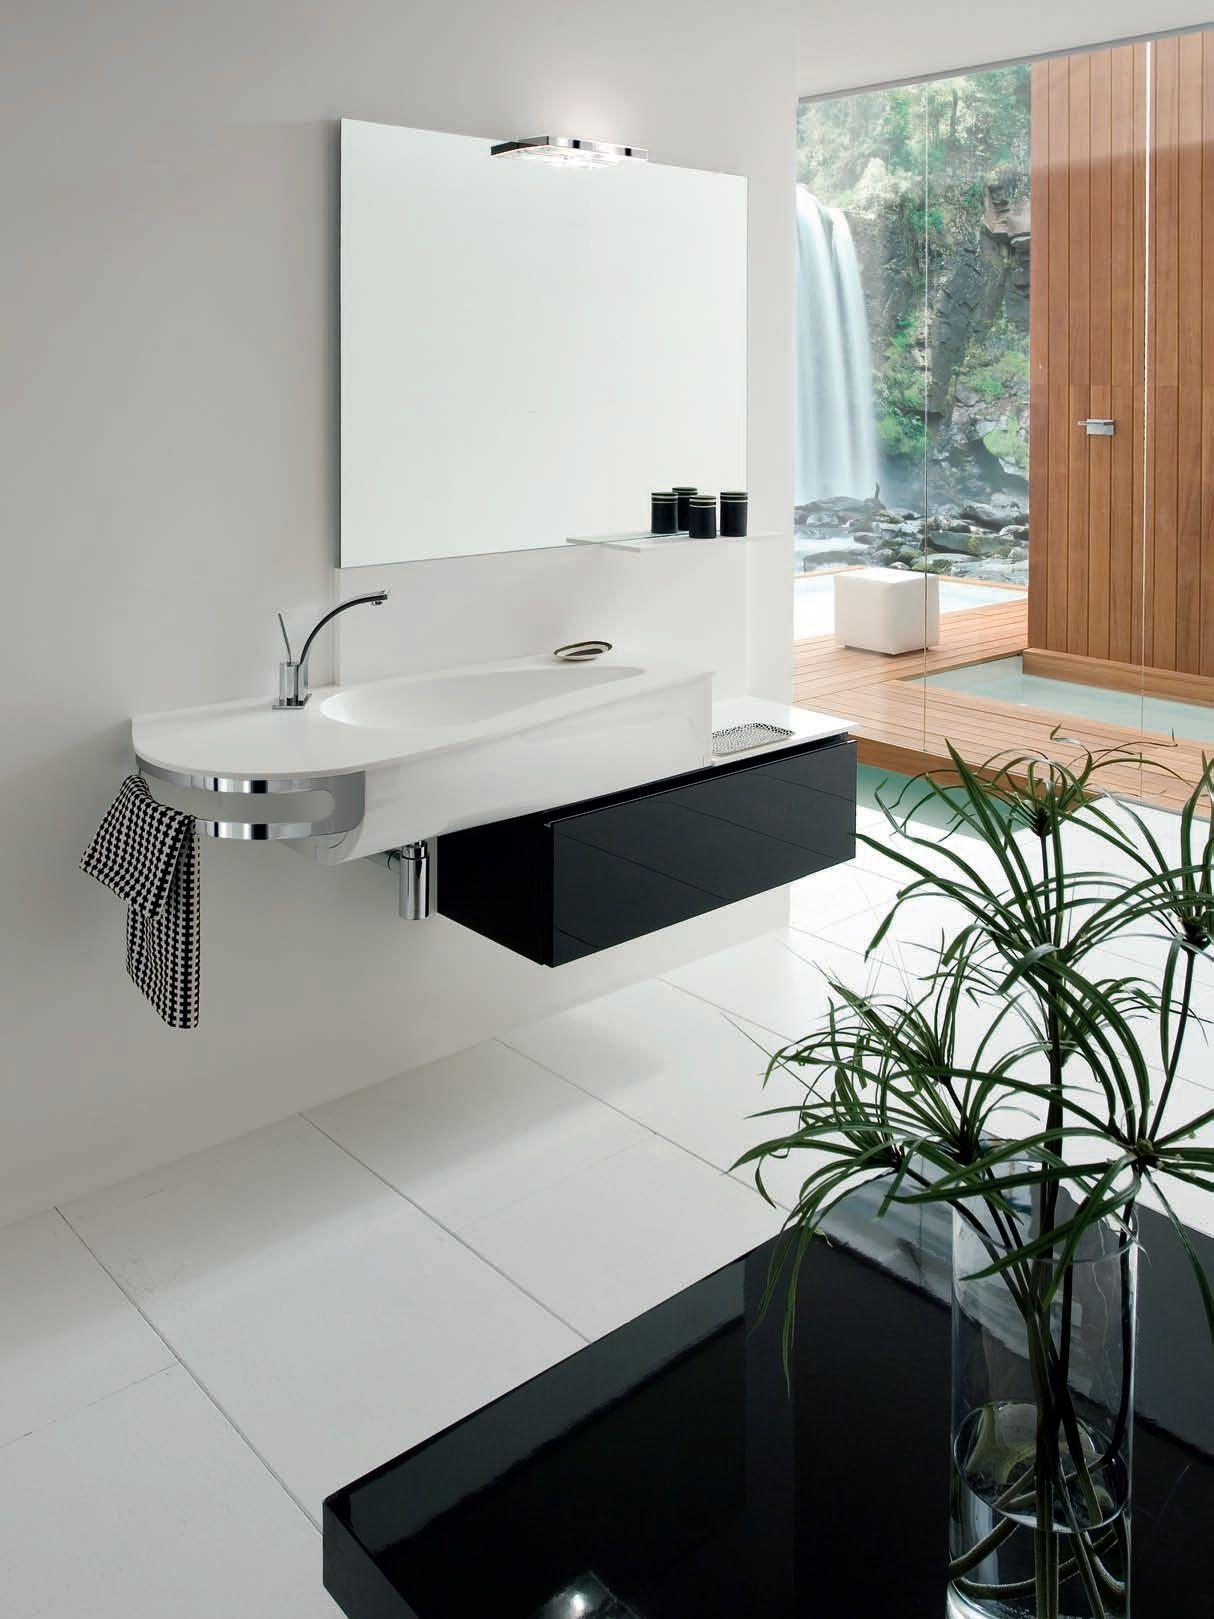 Mobile lavabo singolo ab 7024 rab arredobagno - Rab arredo bagno ...